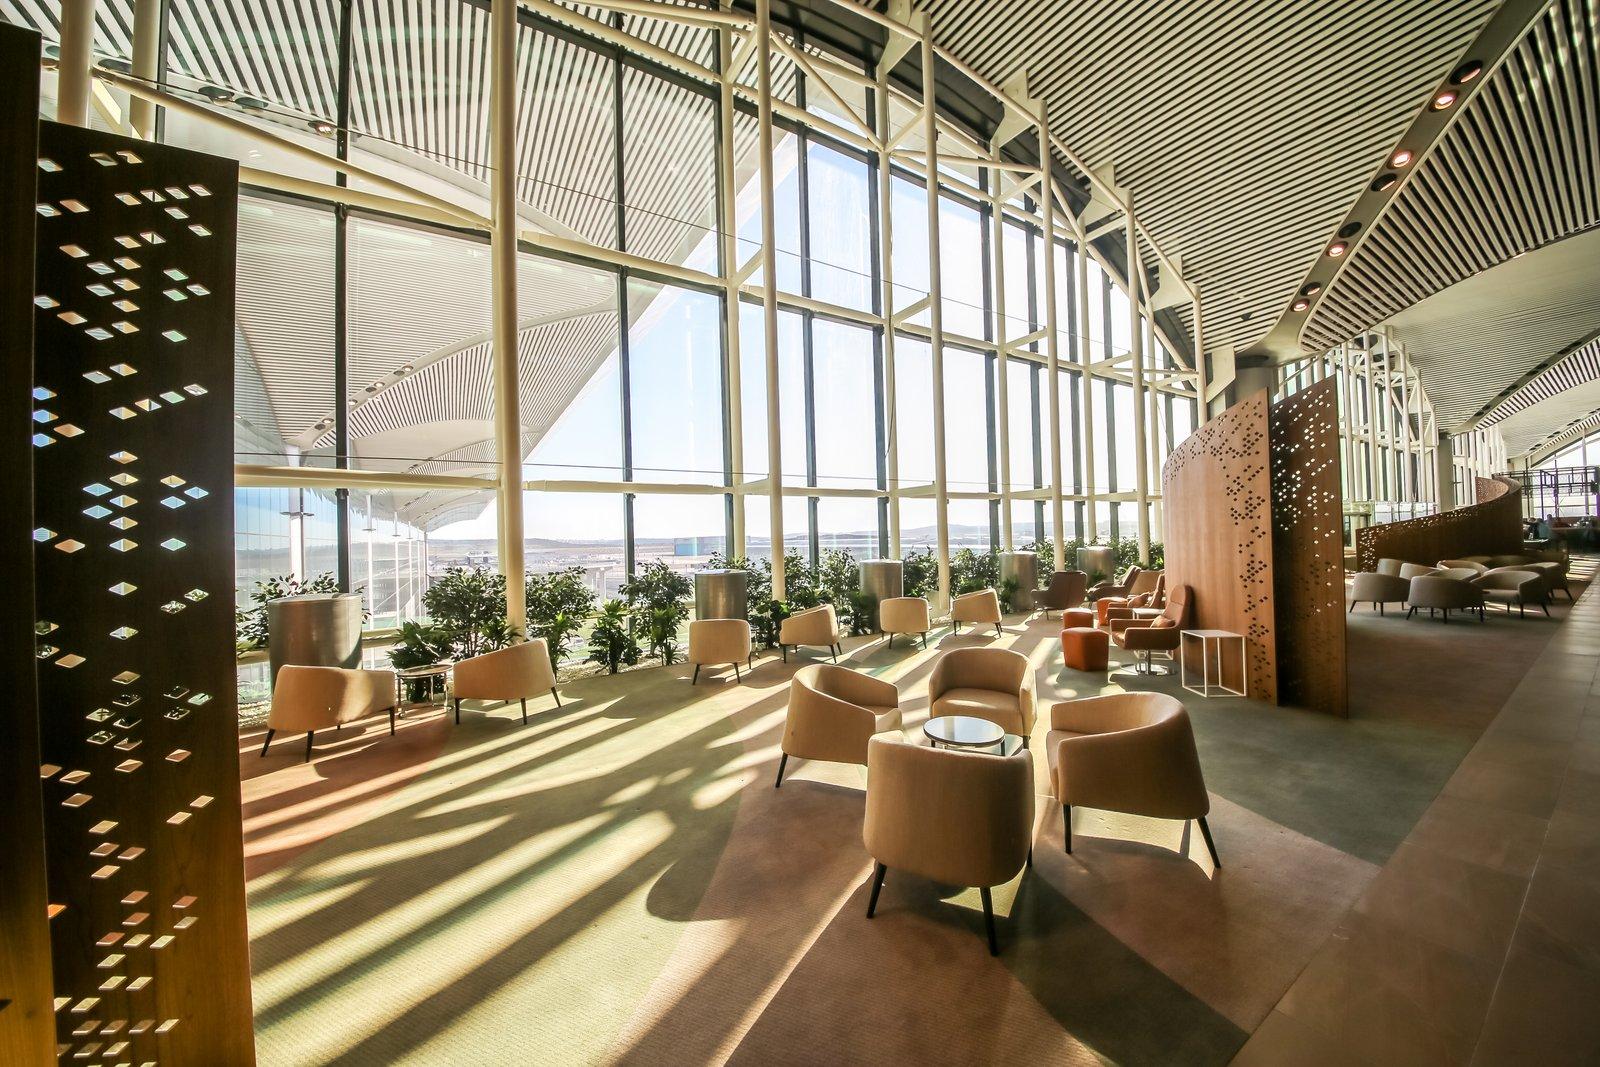 Istanbulin lentokentän lounget